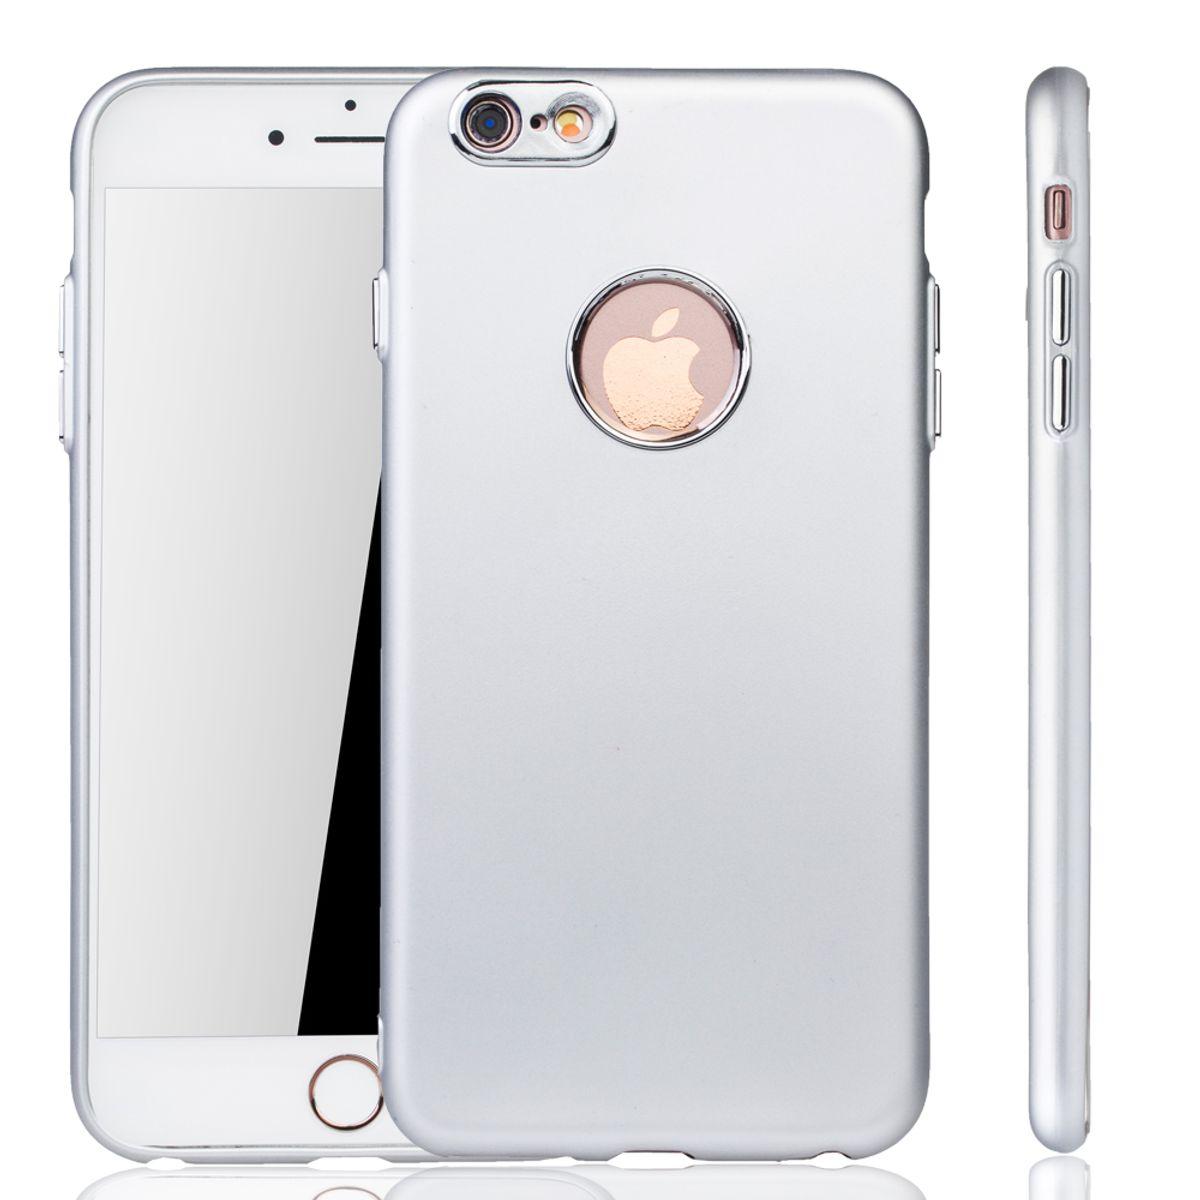 Apple iPhone 6 / 6s Plus Hülle - Handyhülle für Apple ...